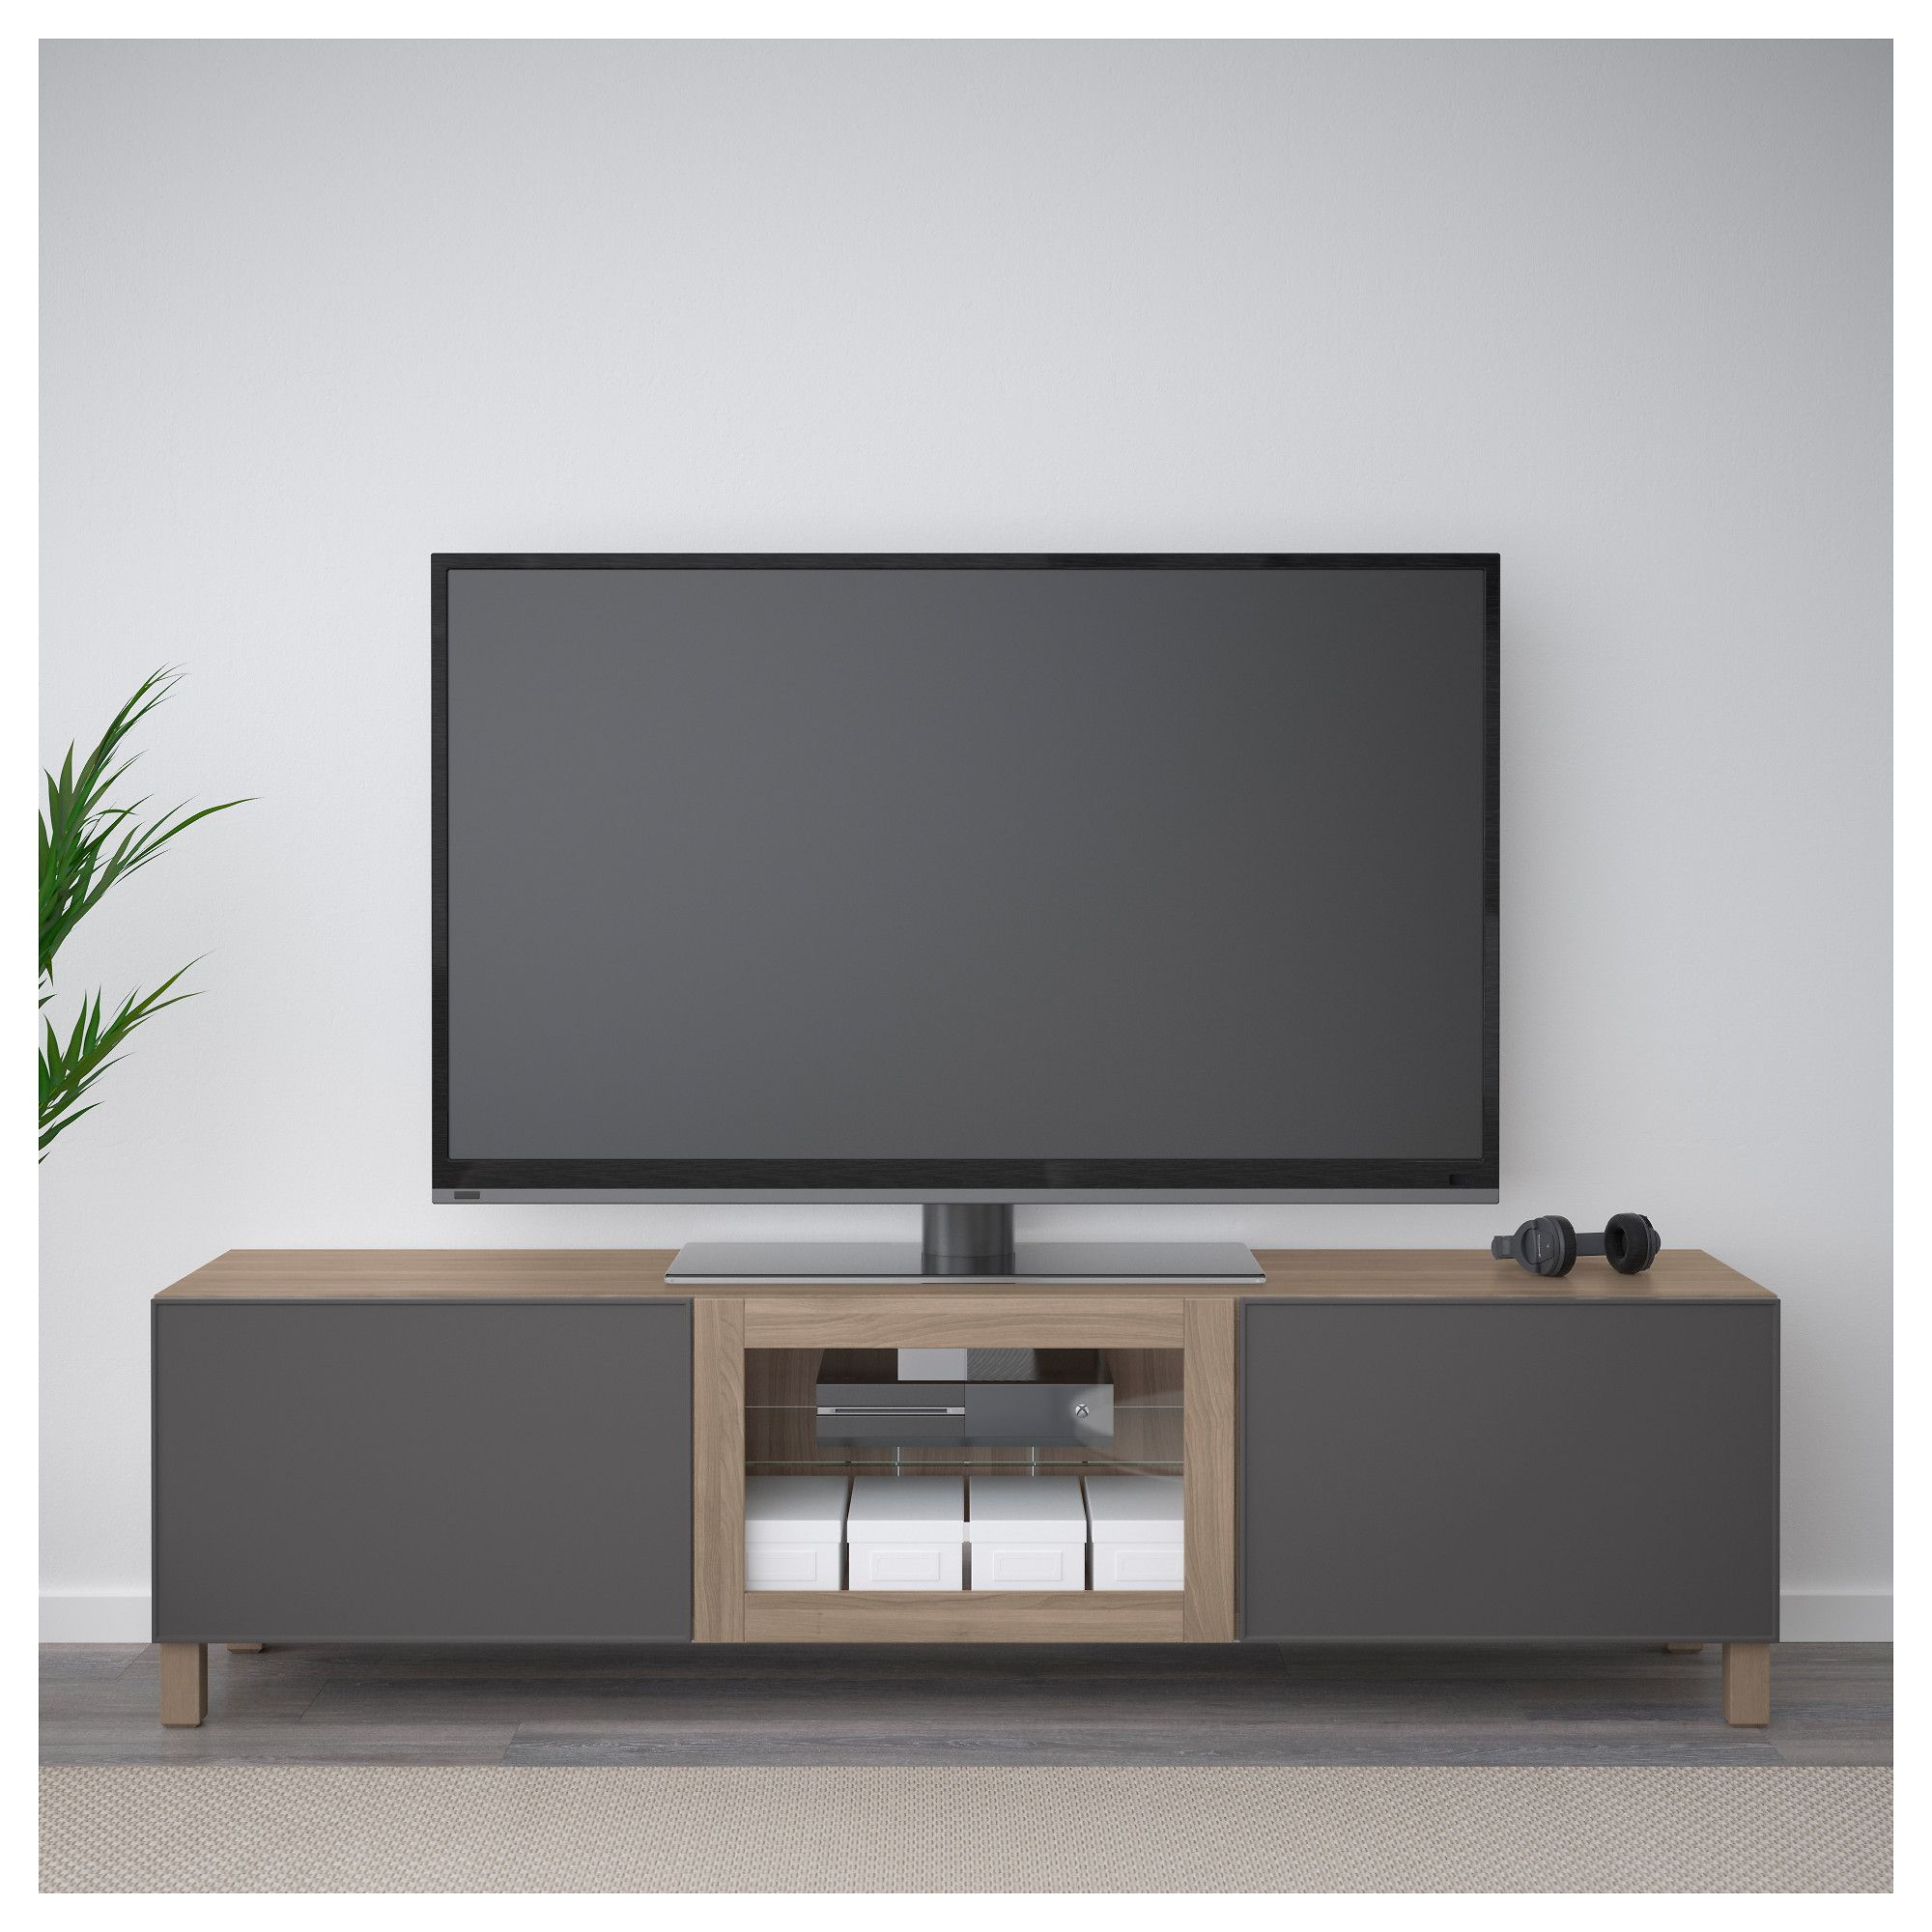 Furniture And Home Furnishings Ikea Tv Unit Furniture